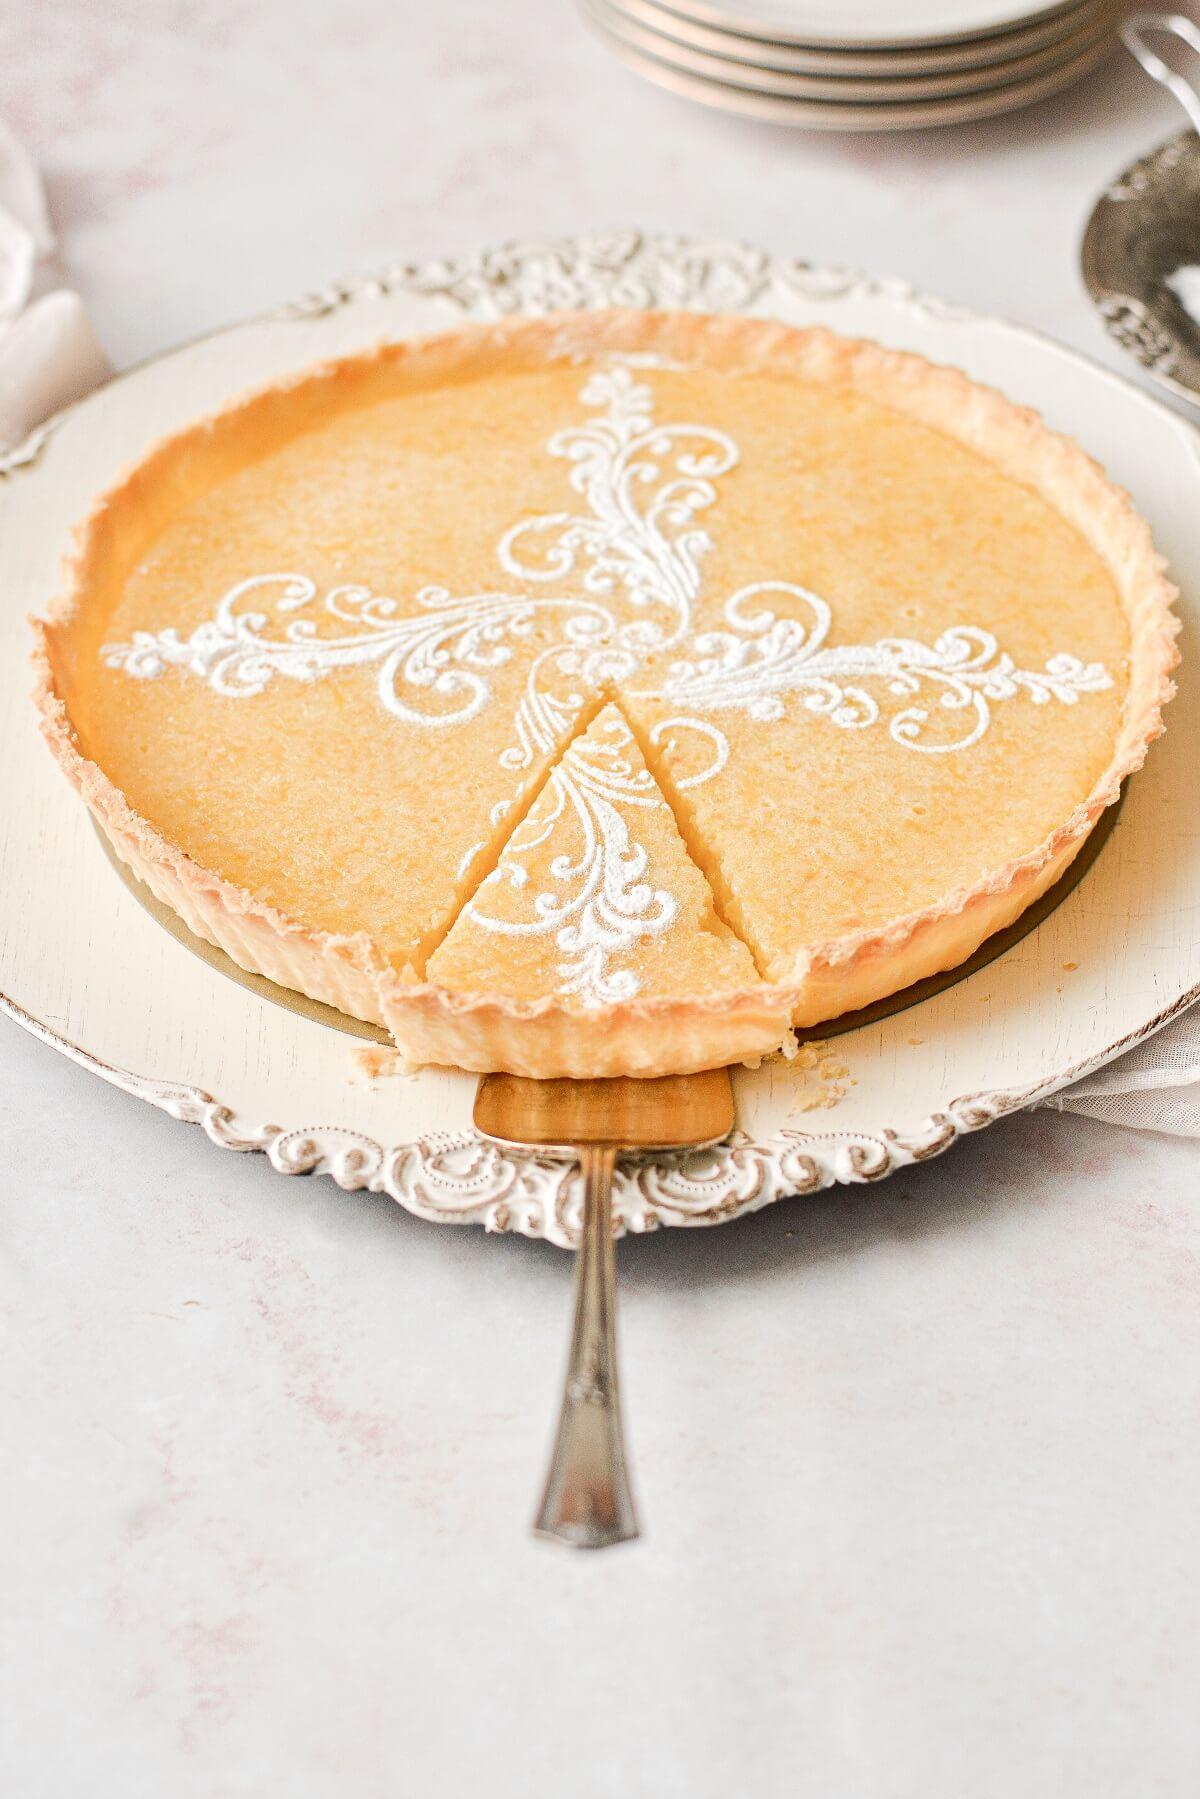 A lemon tart with one slice cut.